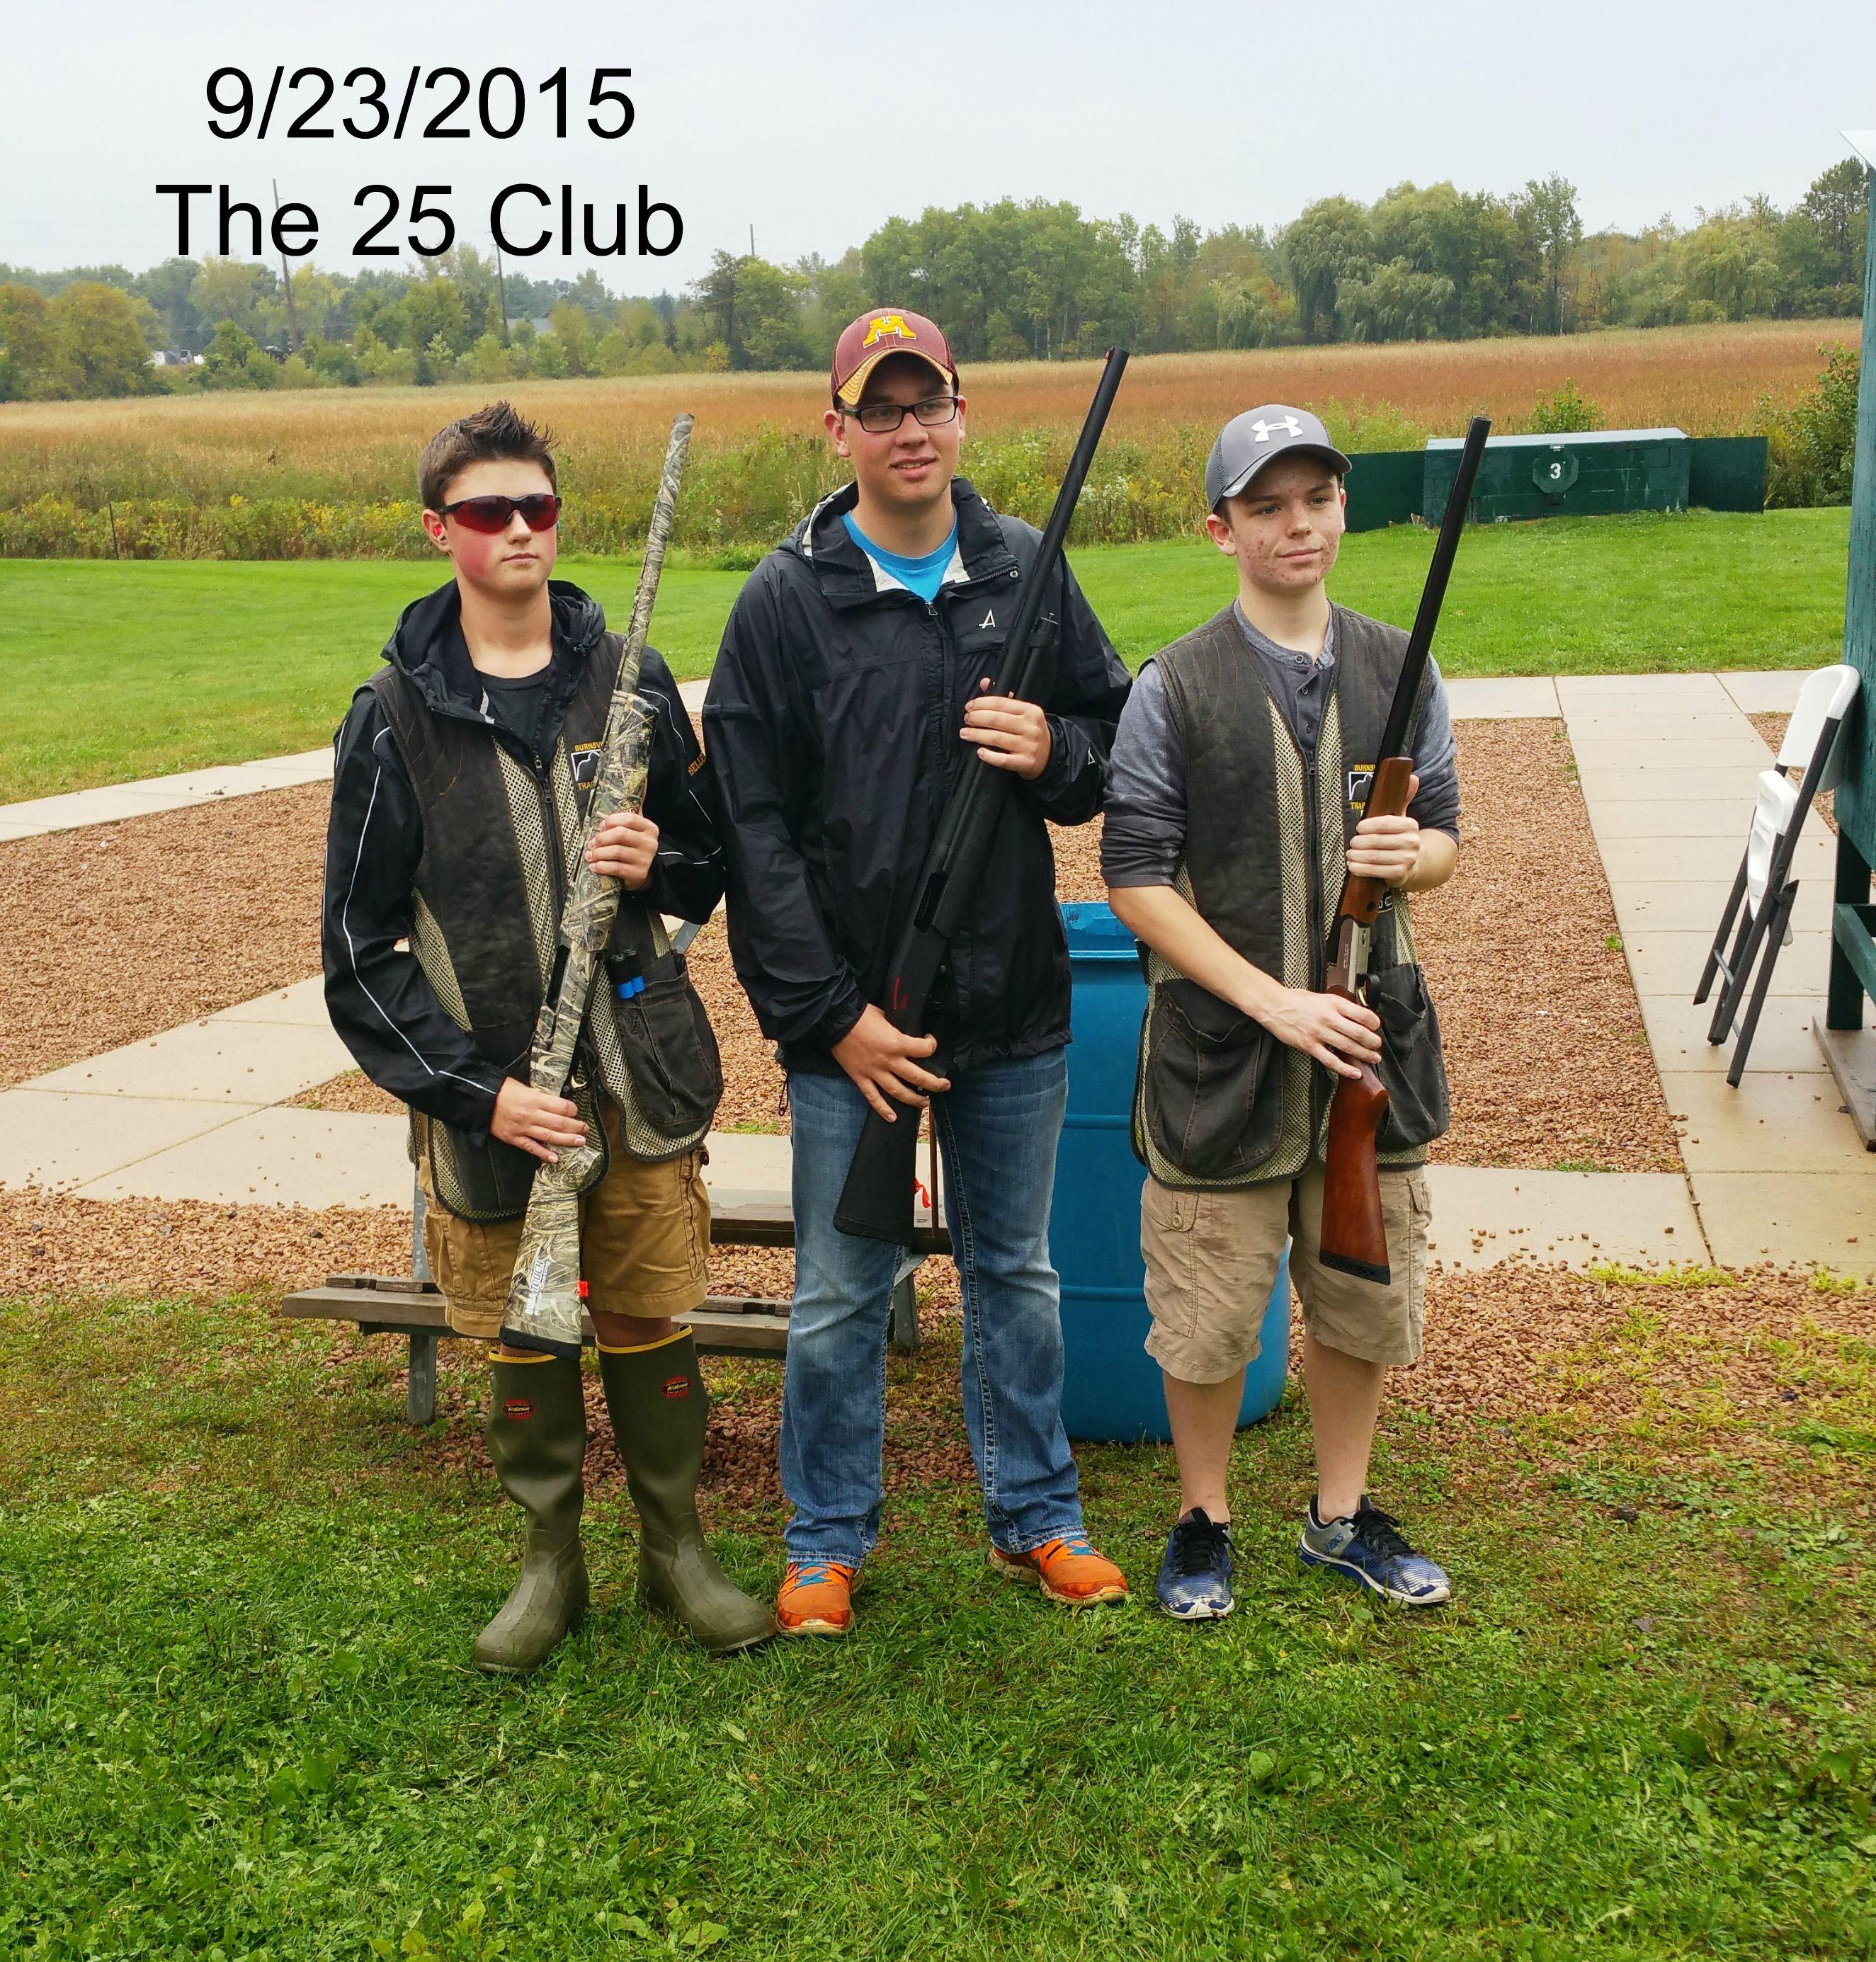 The 25 club 9-23-2015